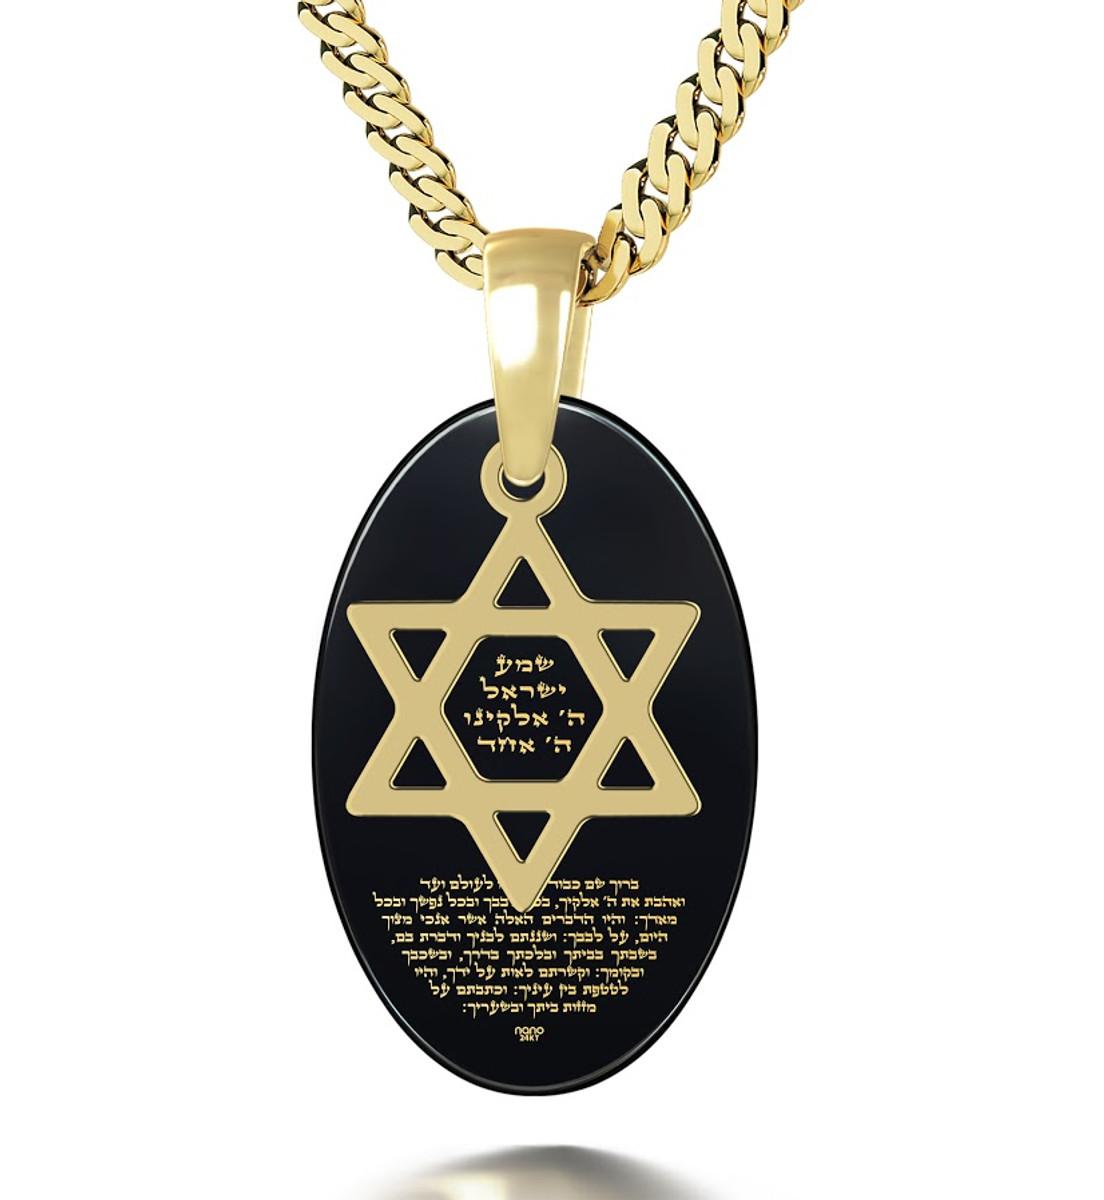 Black Inspirational Jewelry Gold Oval Star of David Necklace